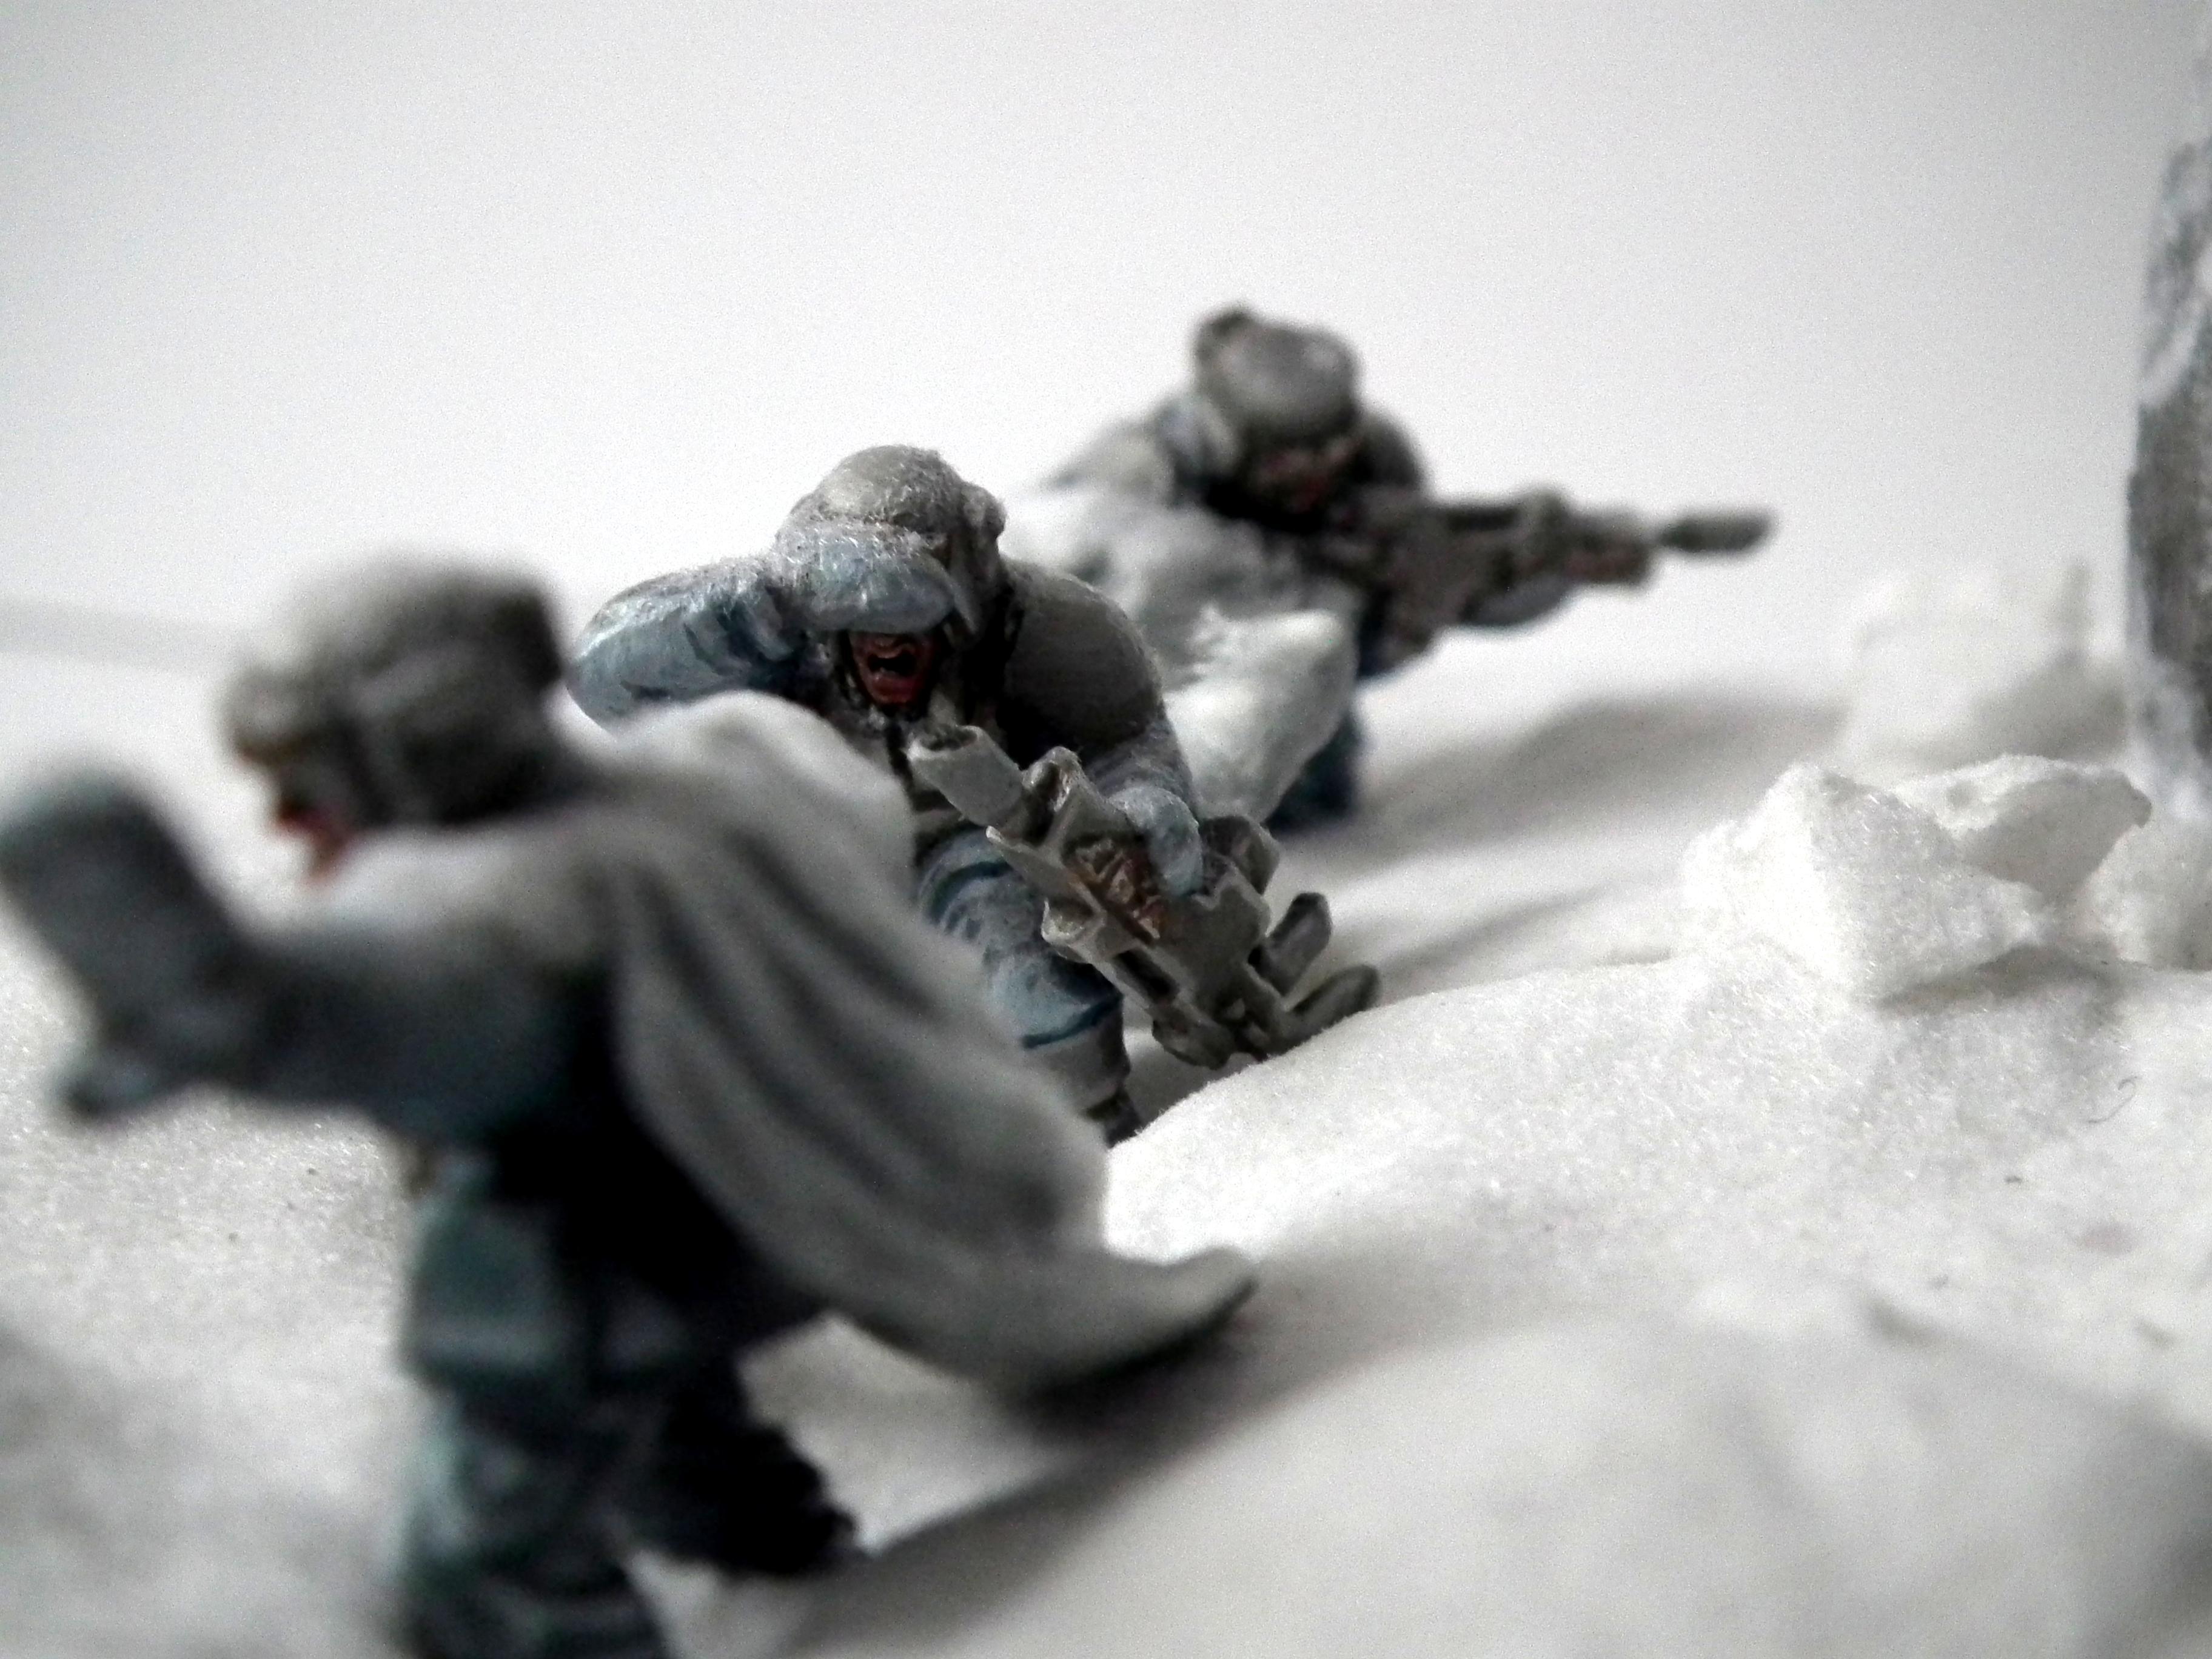 Ambush, Camouflage, Diorama, Duel, Hills, Imperial Guard, Nice, Pathfinders, Perfect, Pva, Snow, Warhammer 40,000, White, Wind, Winter